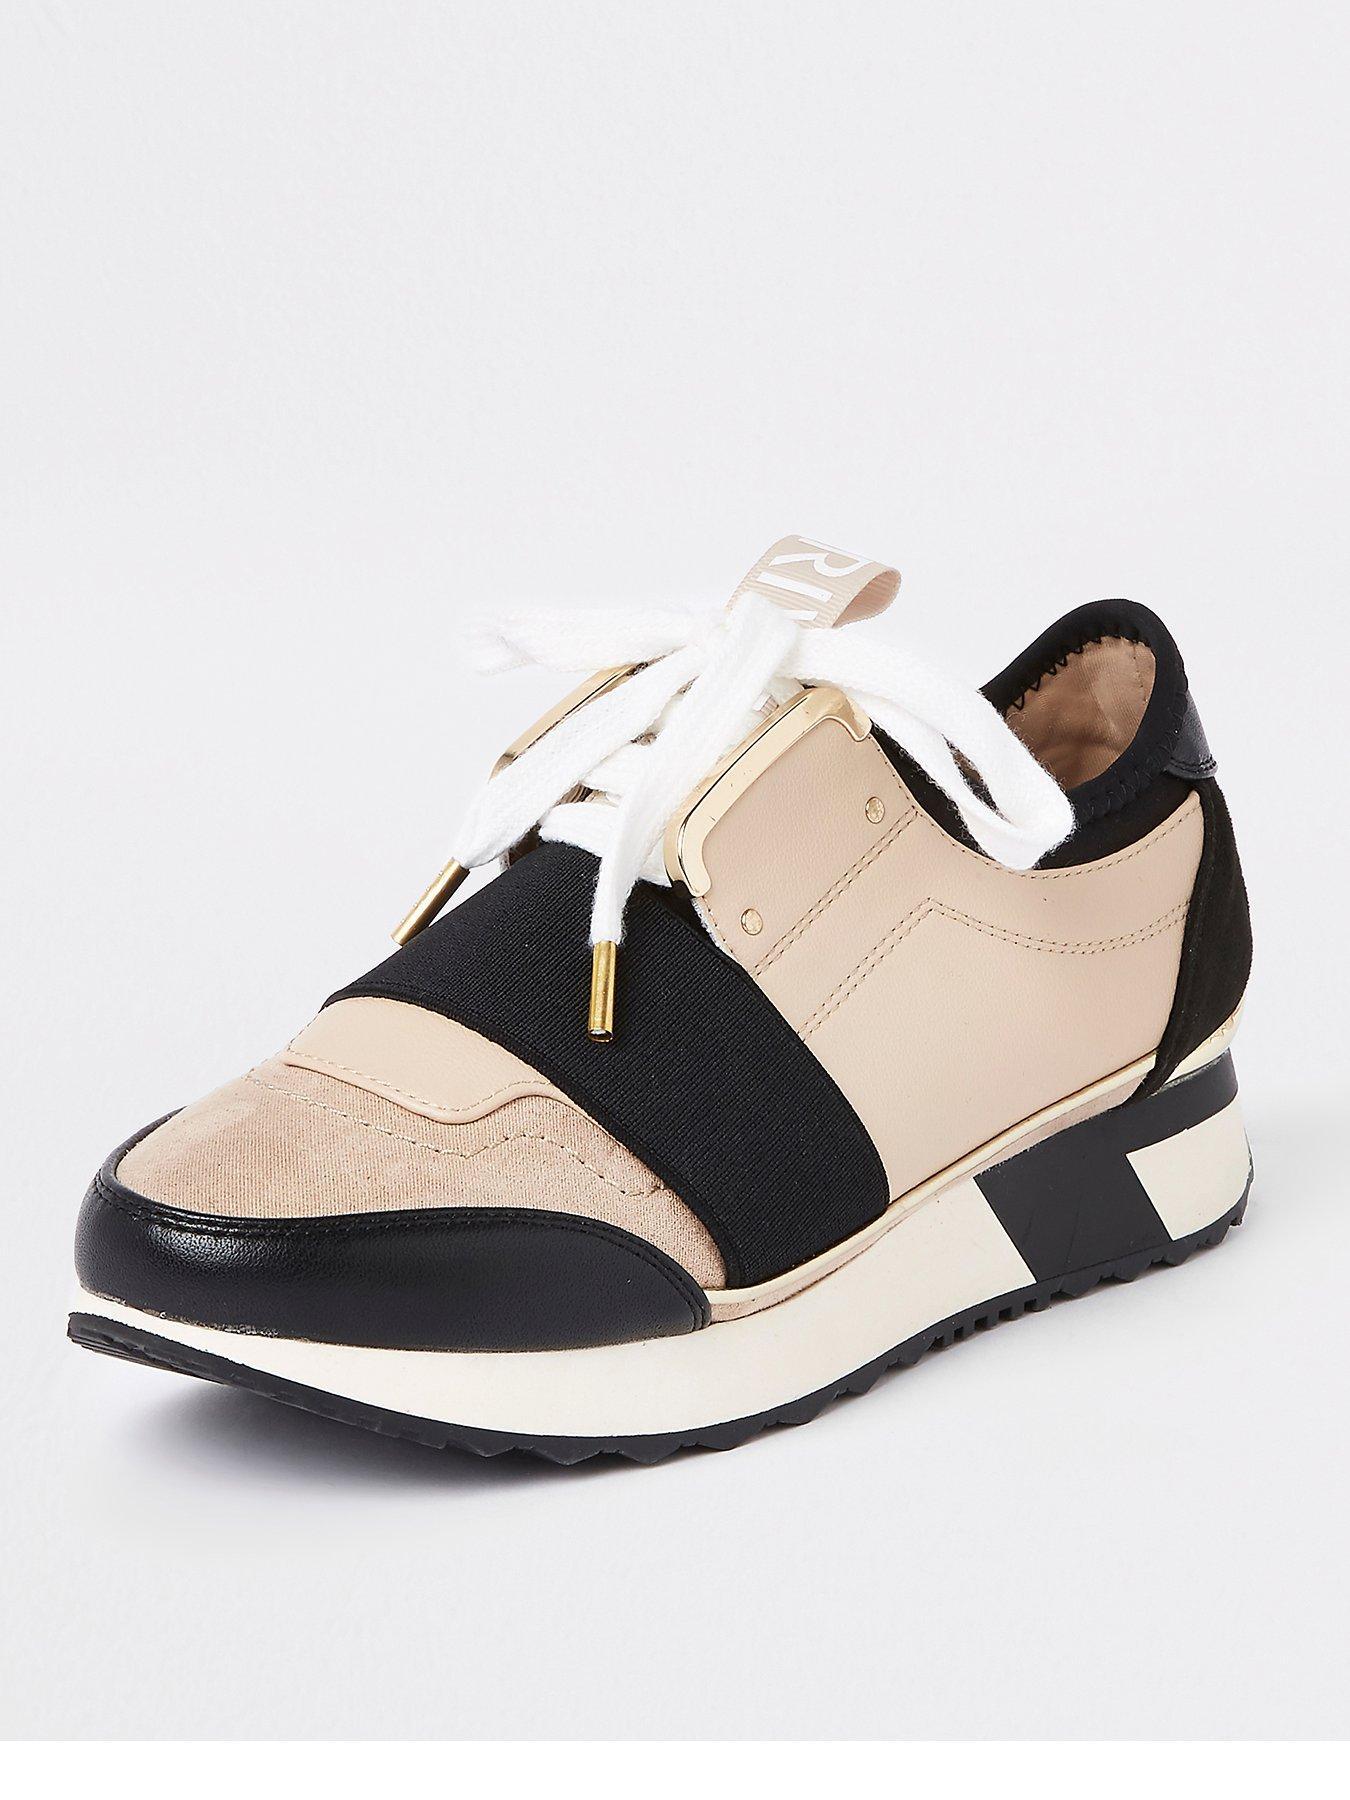 Fashion Trainers   Flats   Shoes